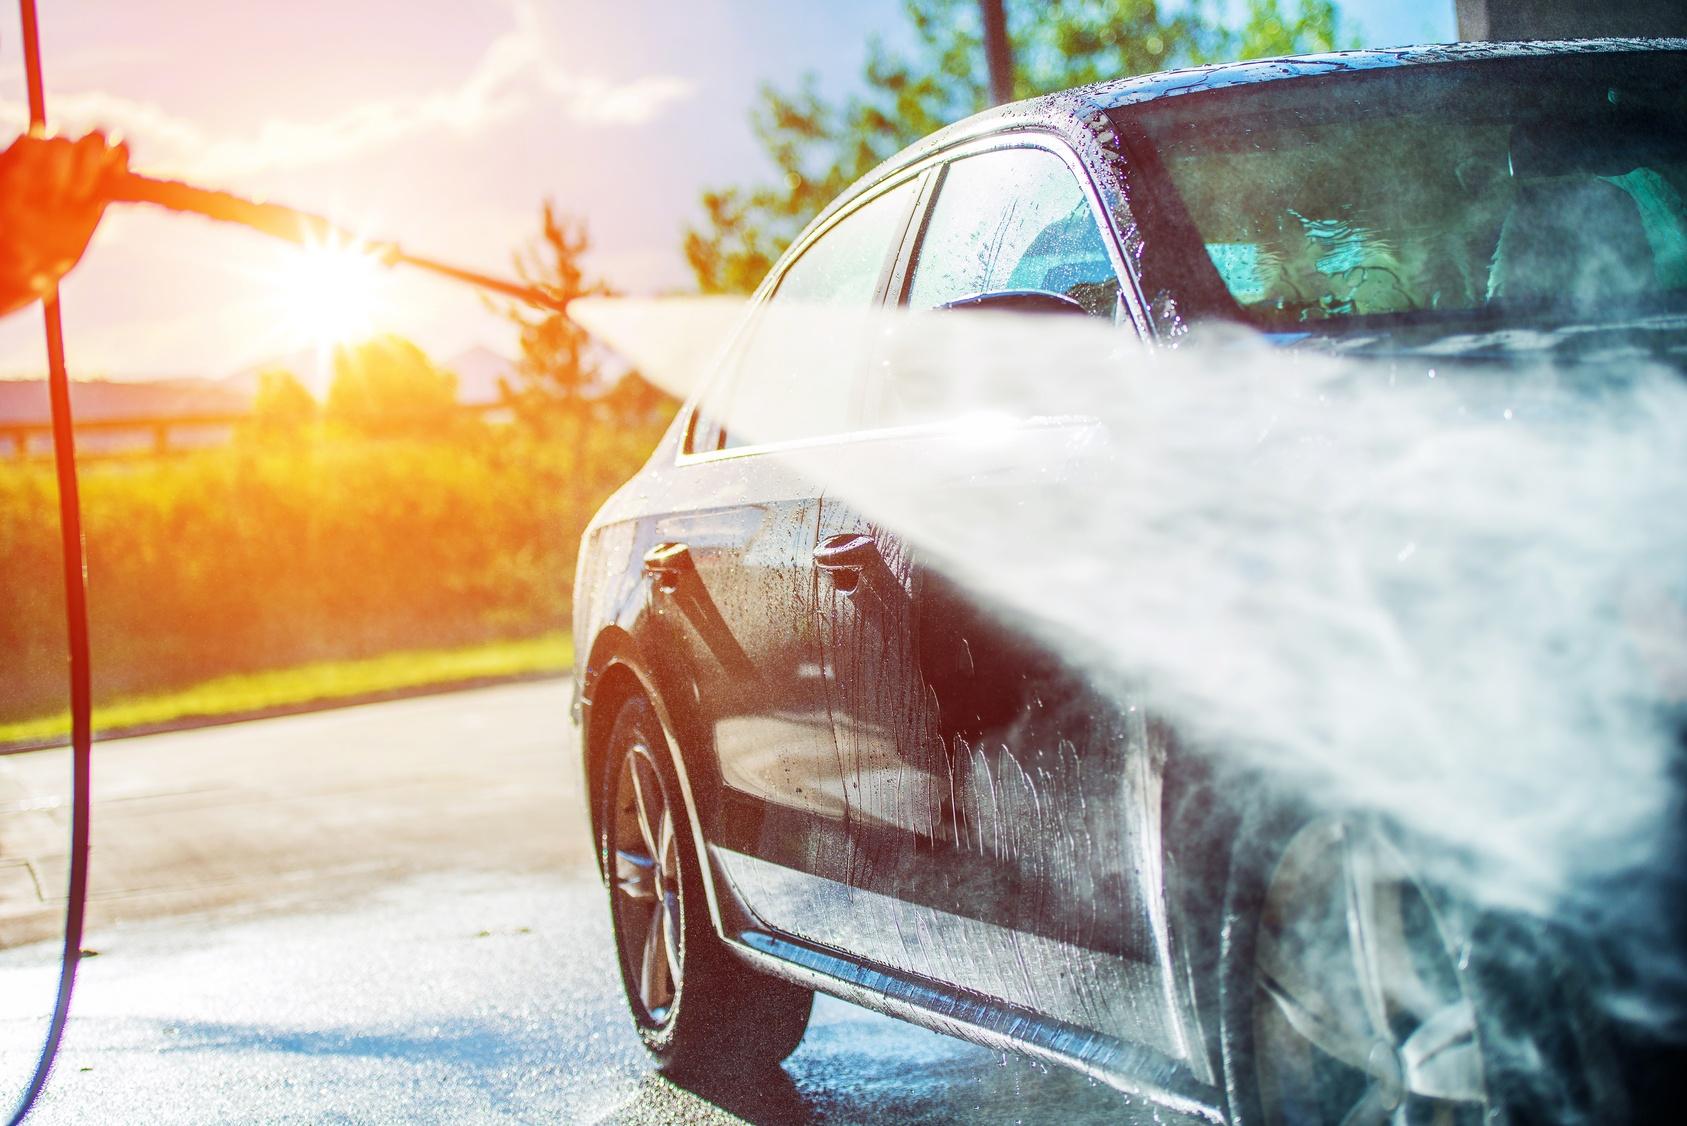 mold begins interior camper extent watch on damage removal water van of cvr my car